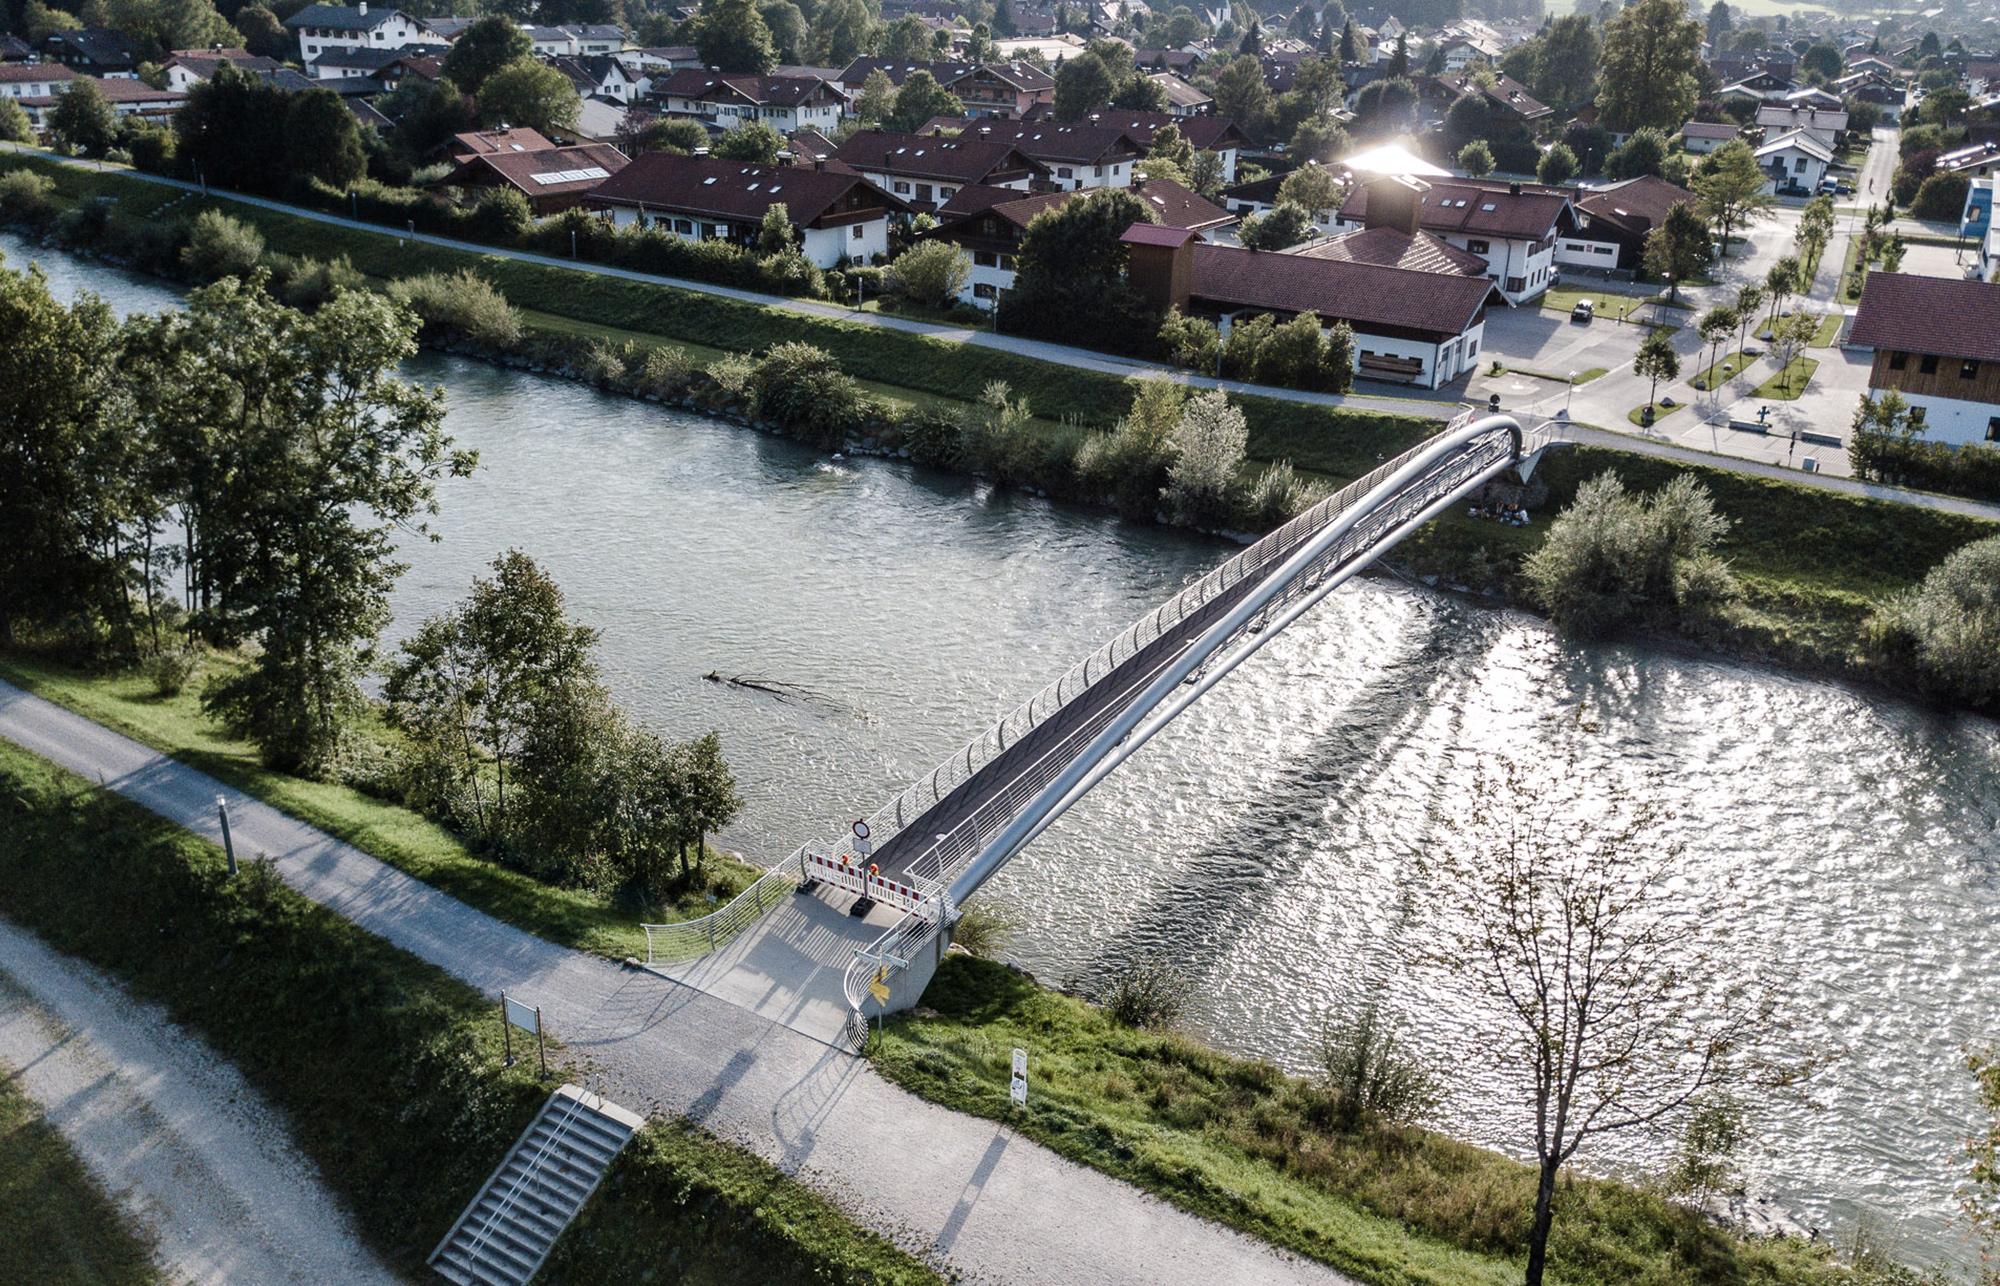 FUSSGÄNGERBRÜCKE MARQUARTSTEIN – Köppl Ingenieure